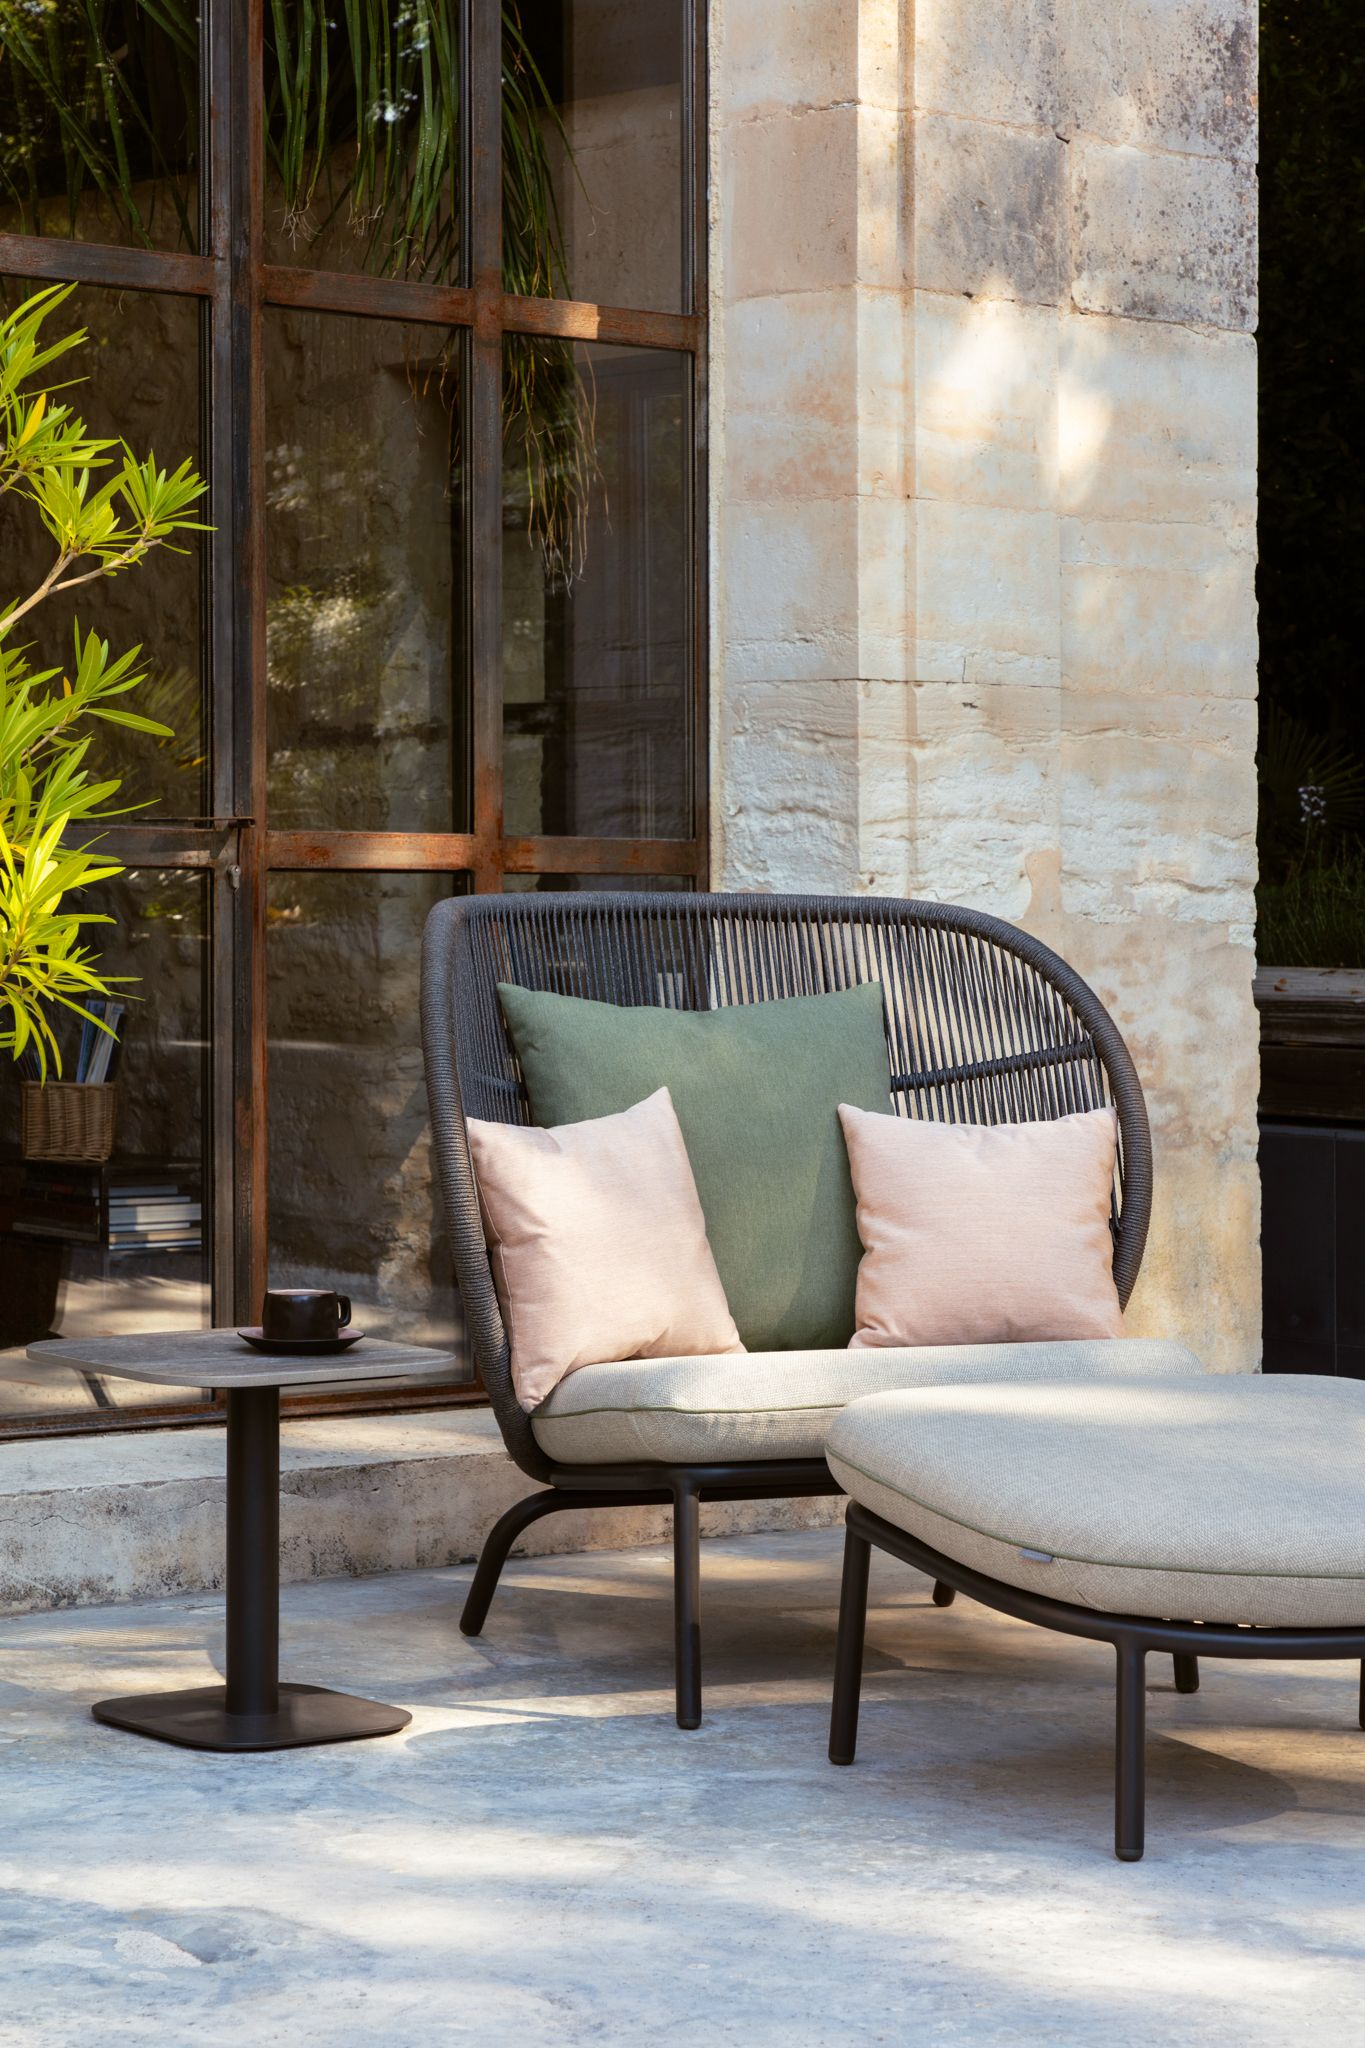 Comfy Outdoor Lounge Set Terrace Furniture Lounge Chair Outdoor Outdoor Furniture Design